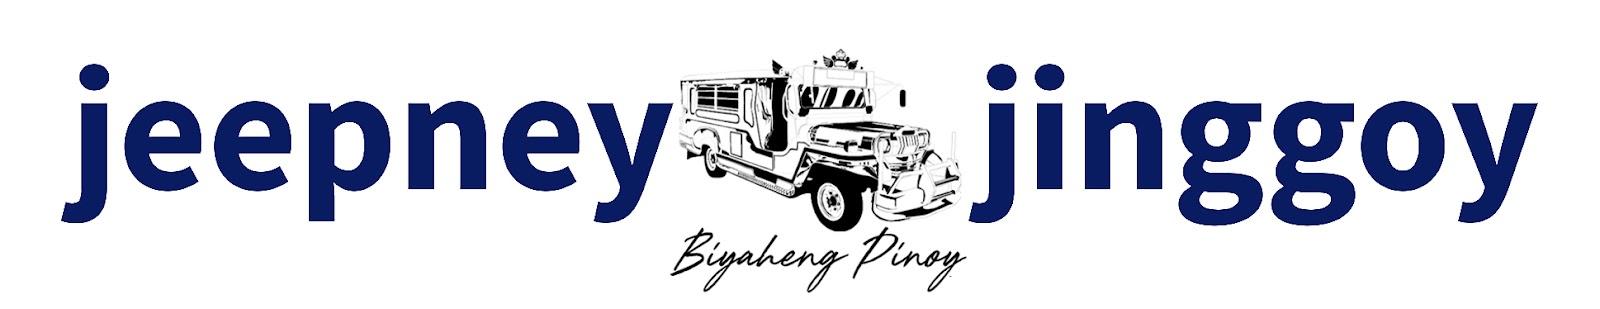 jeepneyjinggoy